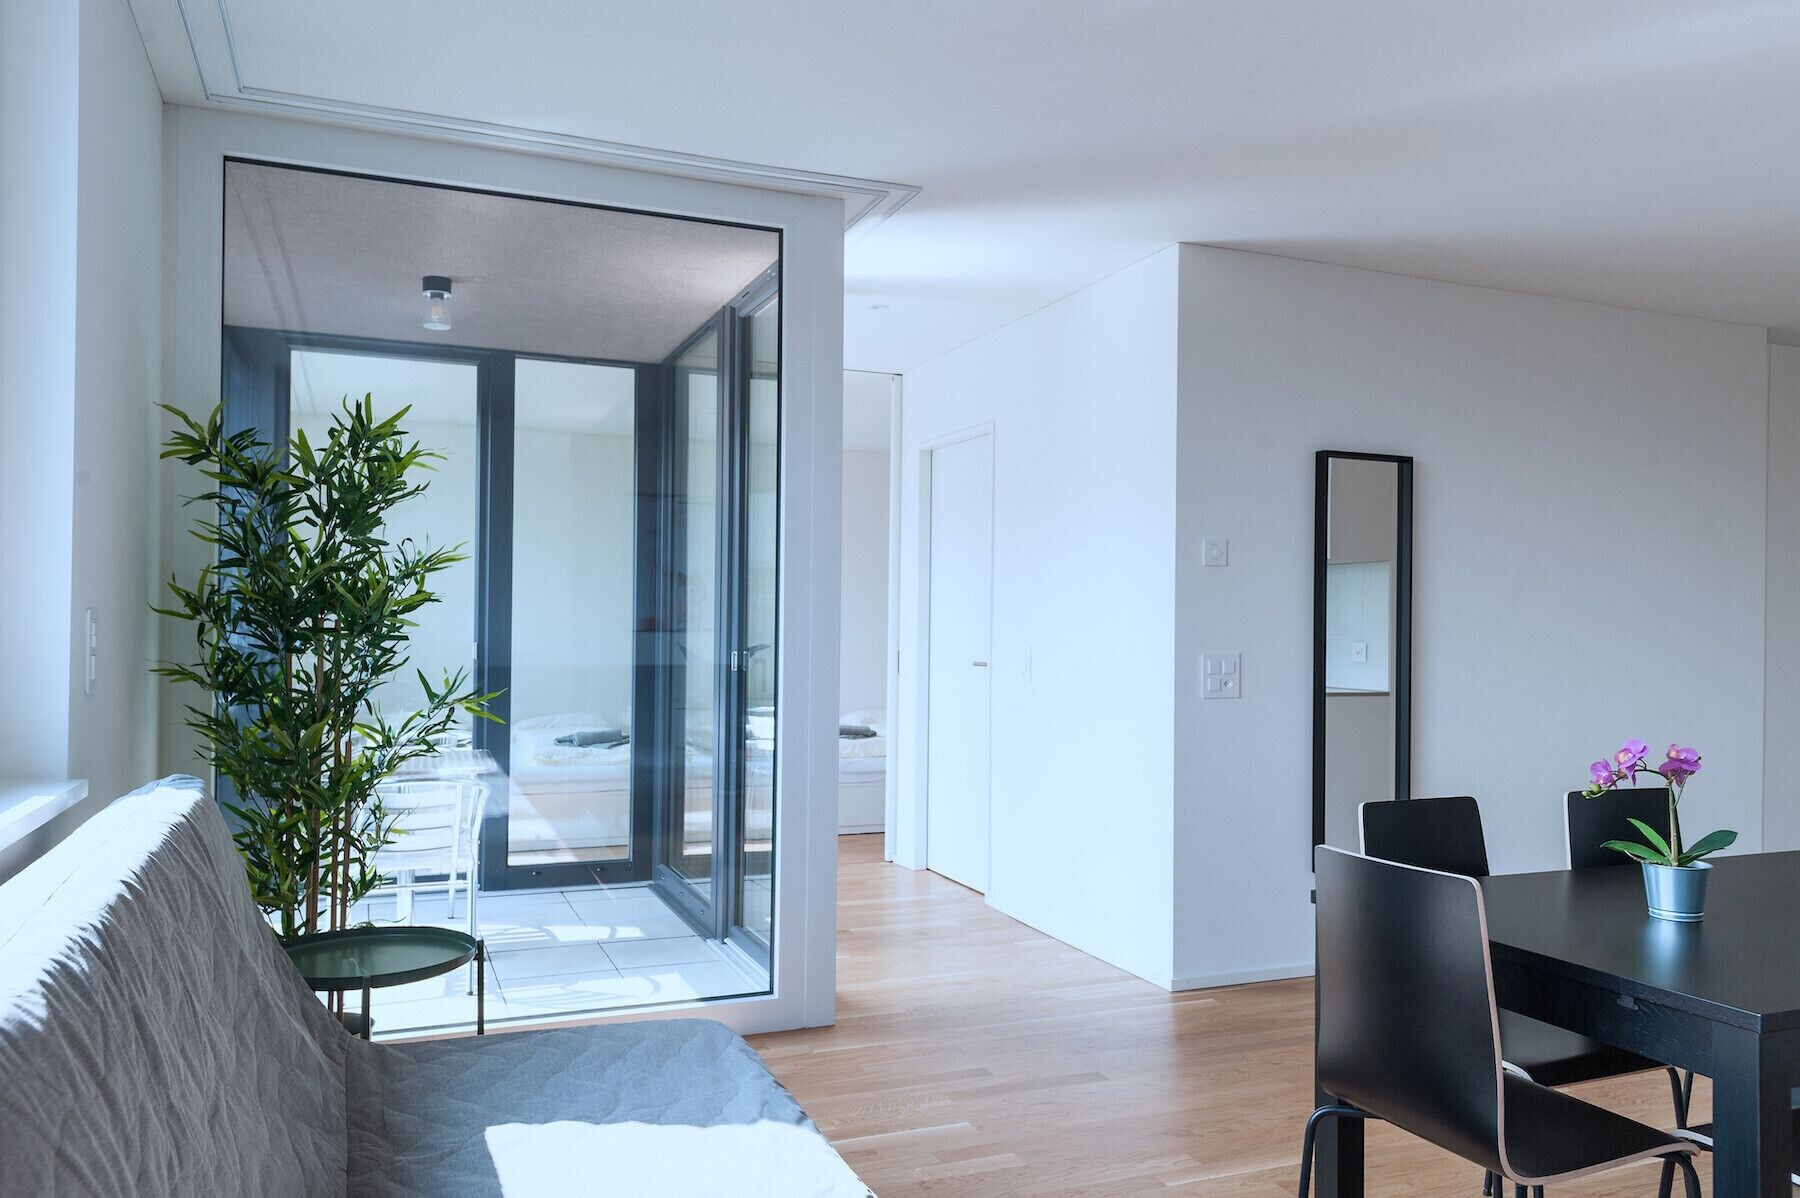 HITrental Basel Apartments, Basel